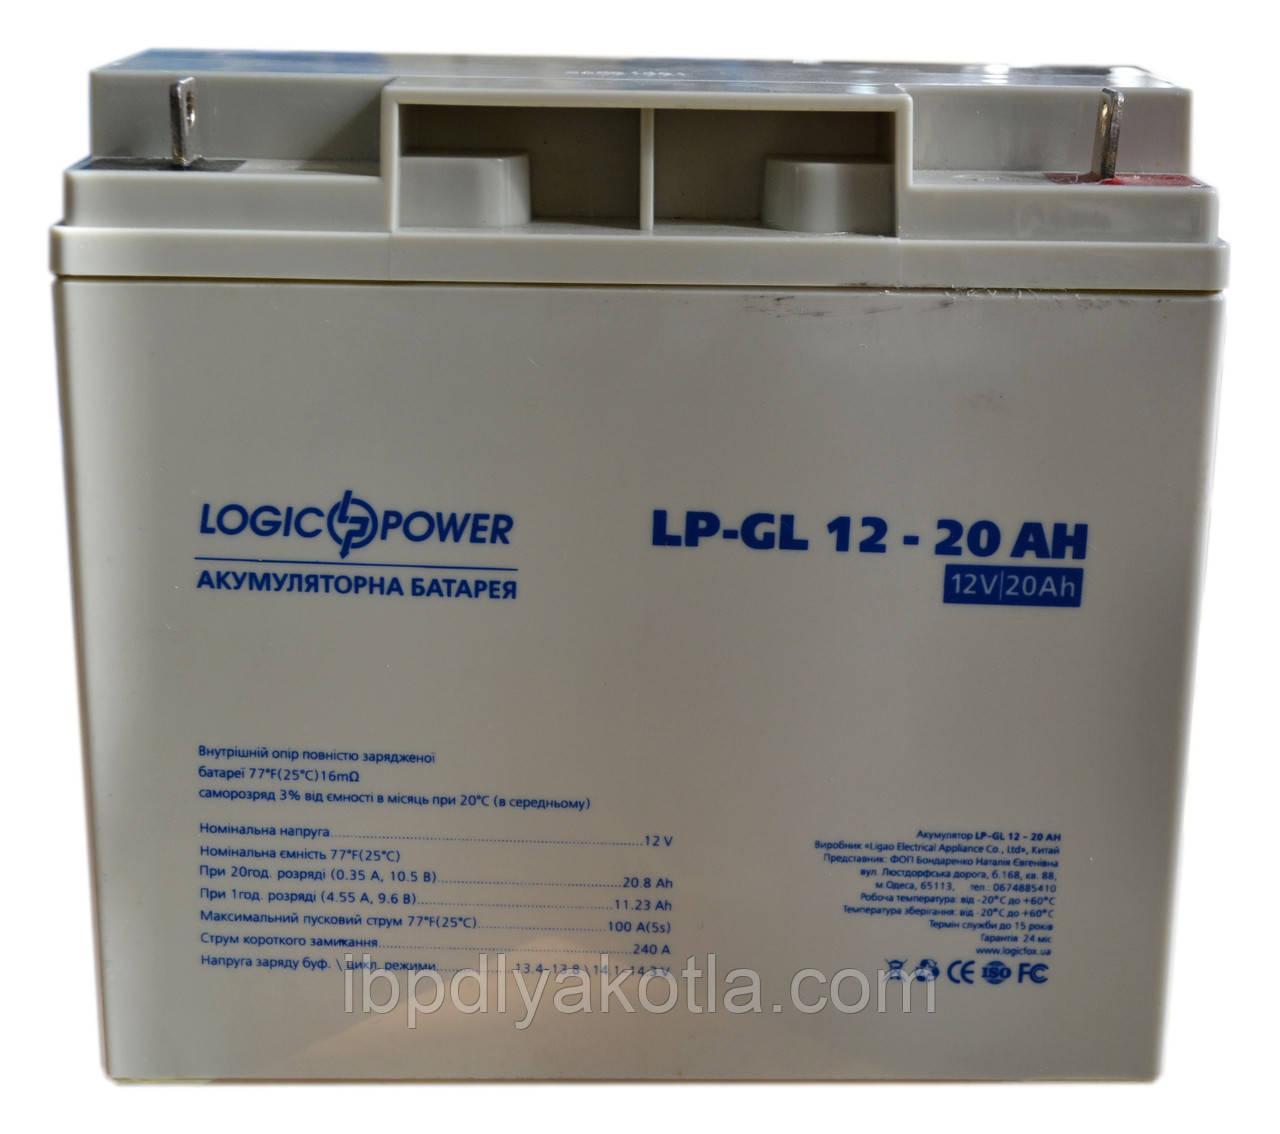 Logicpower LP-GL 12V 20AH